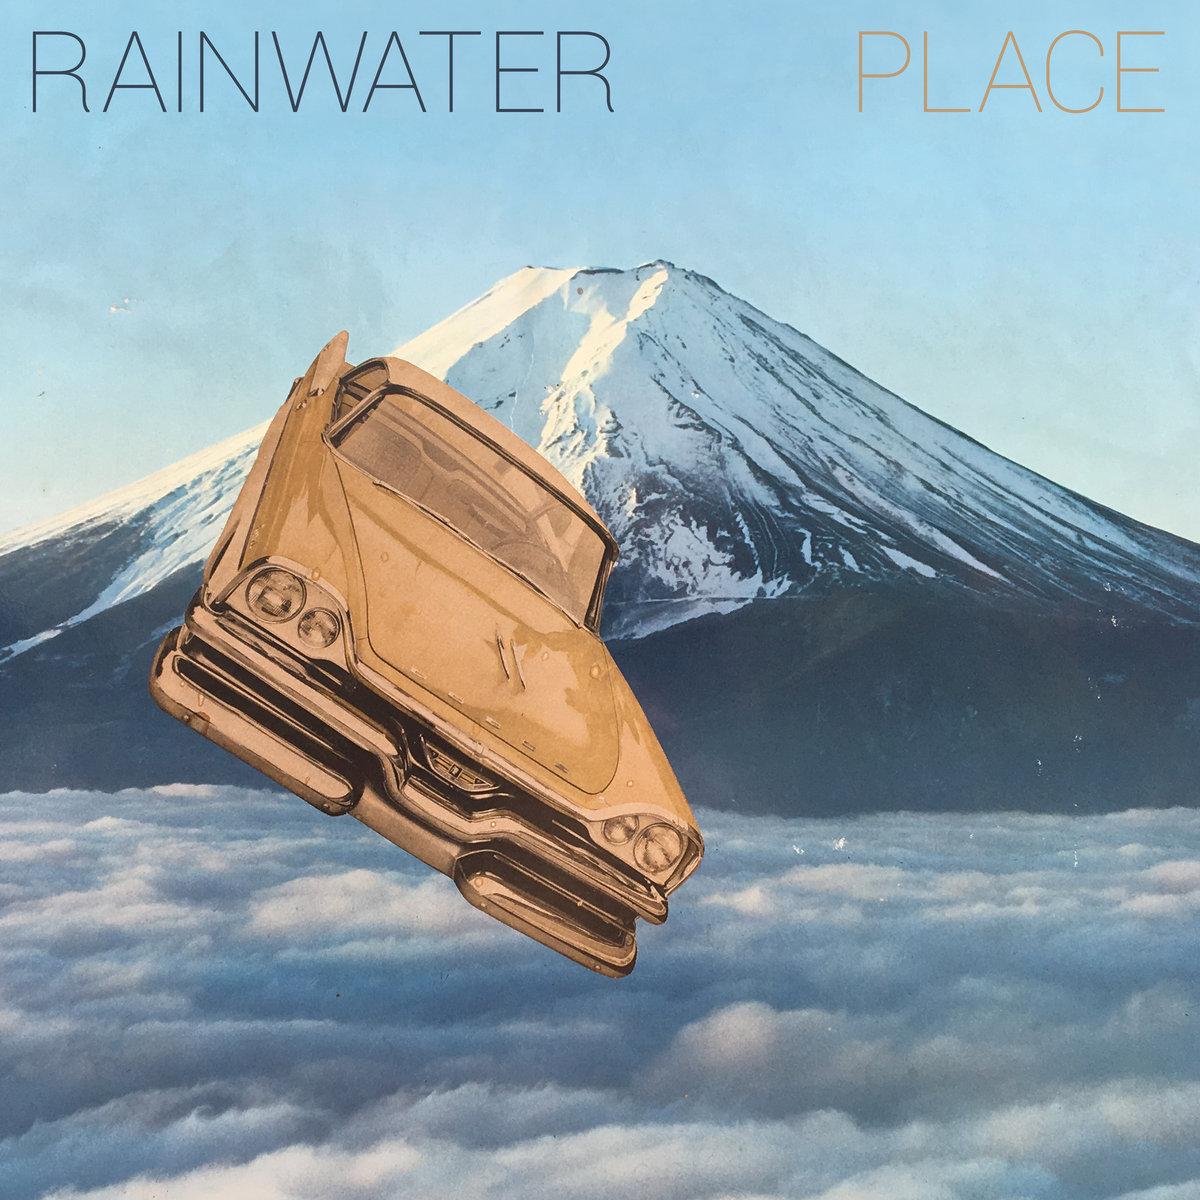 rainwater place artwork